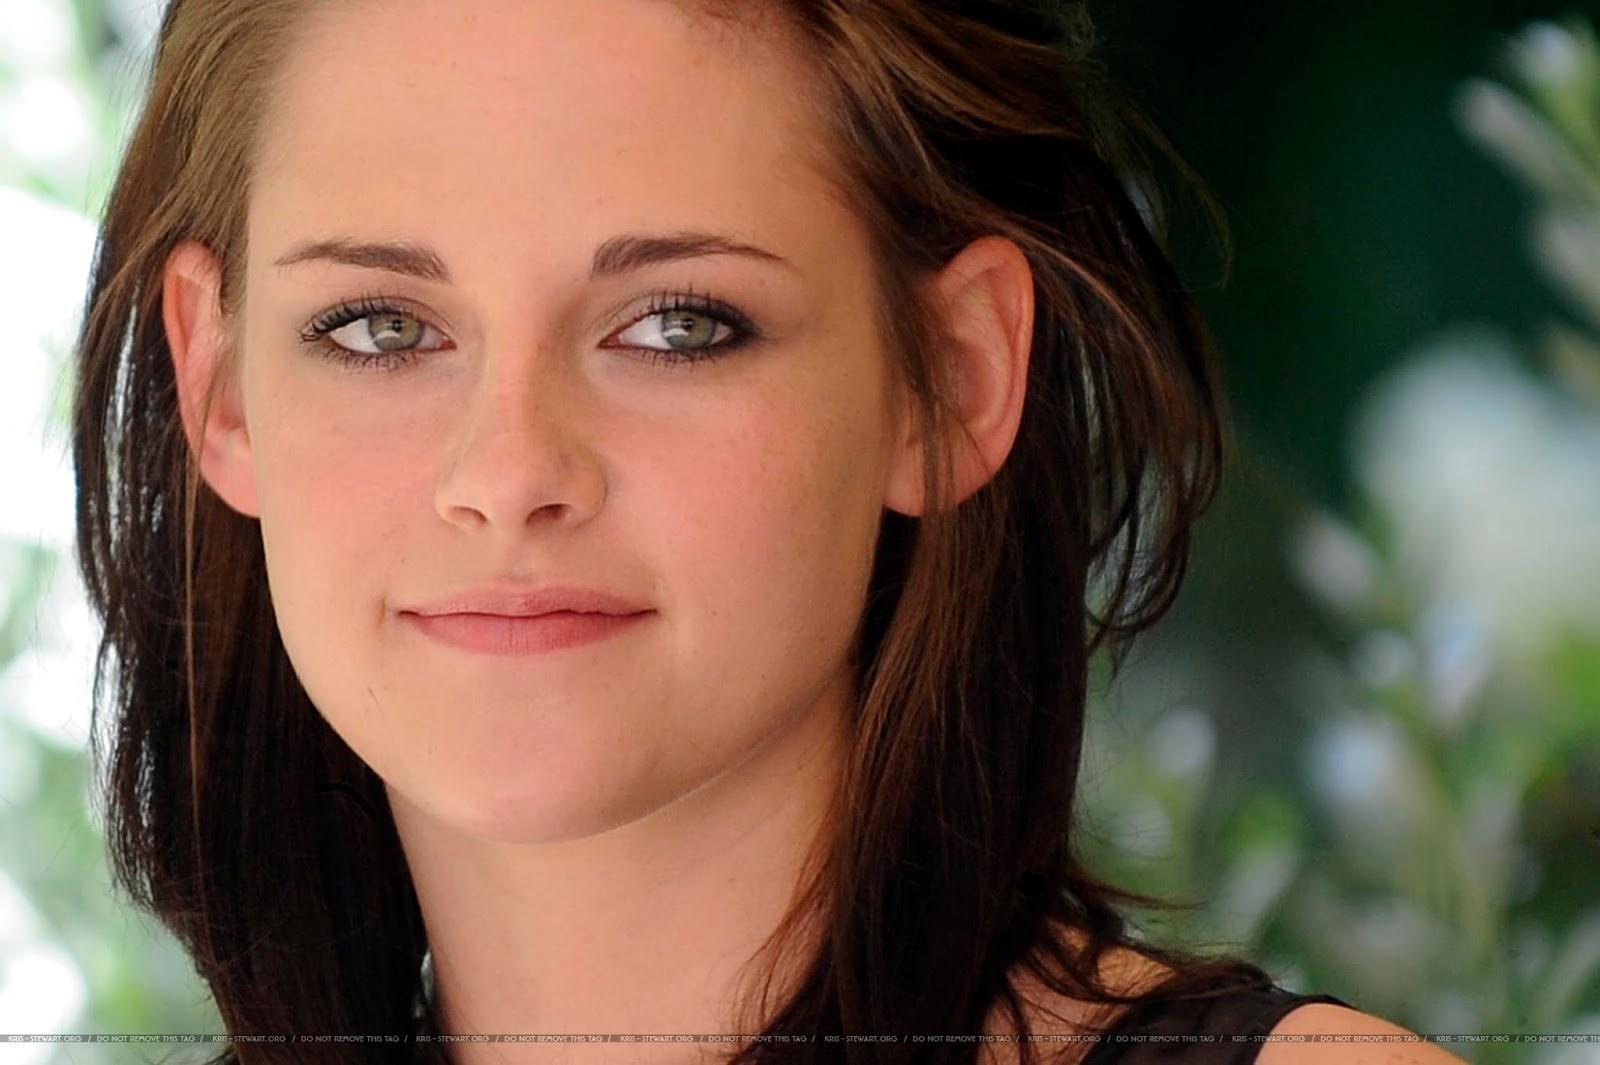 kristen stewart hollywood actress - photo #40